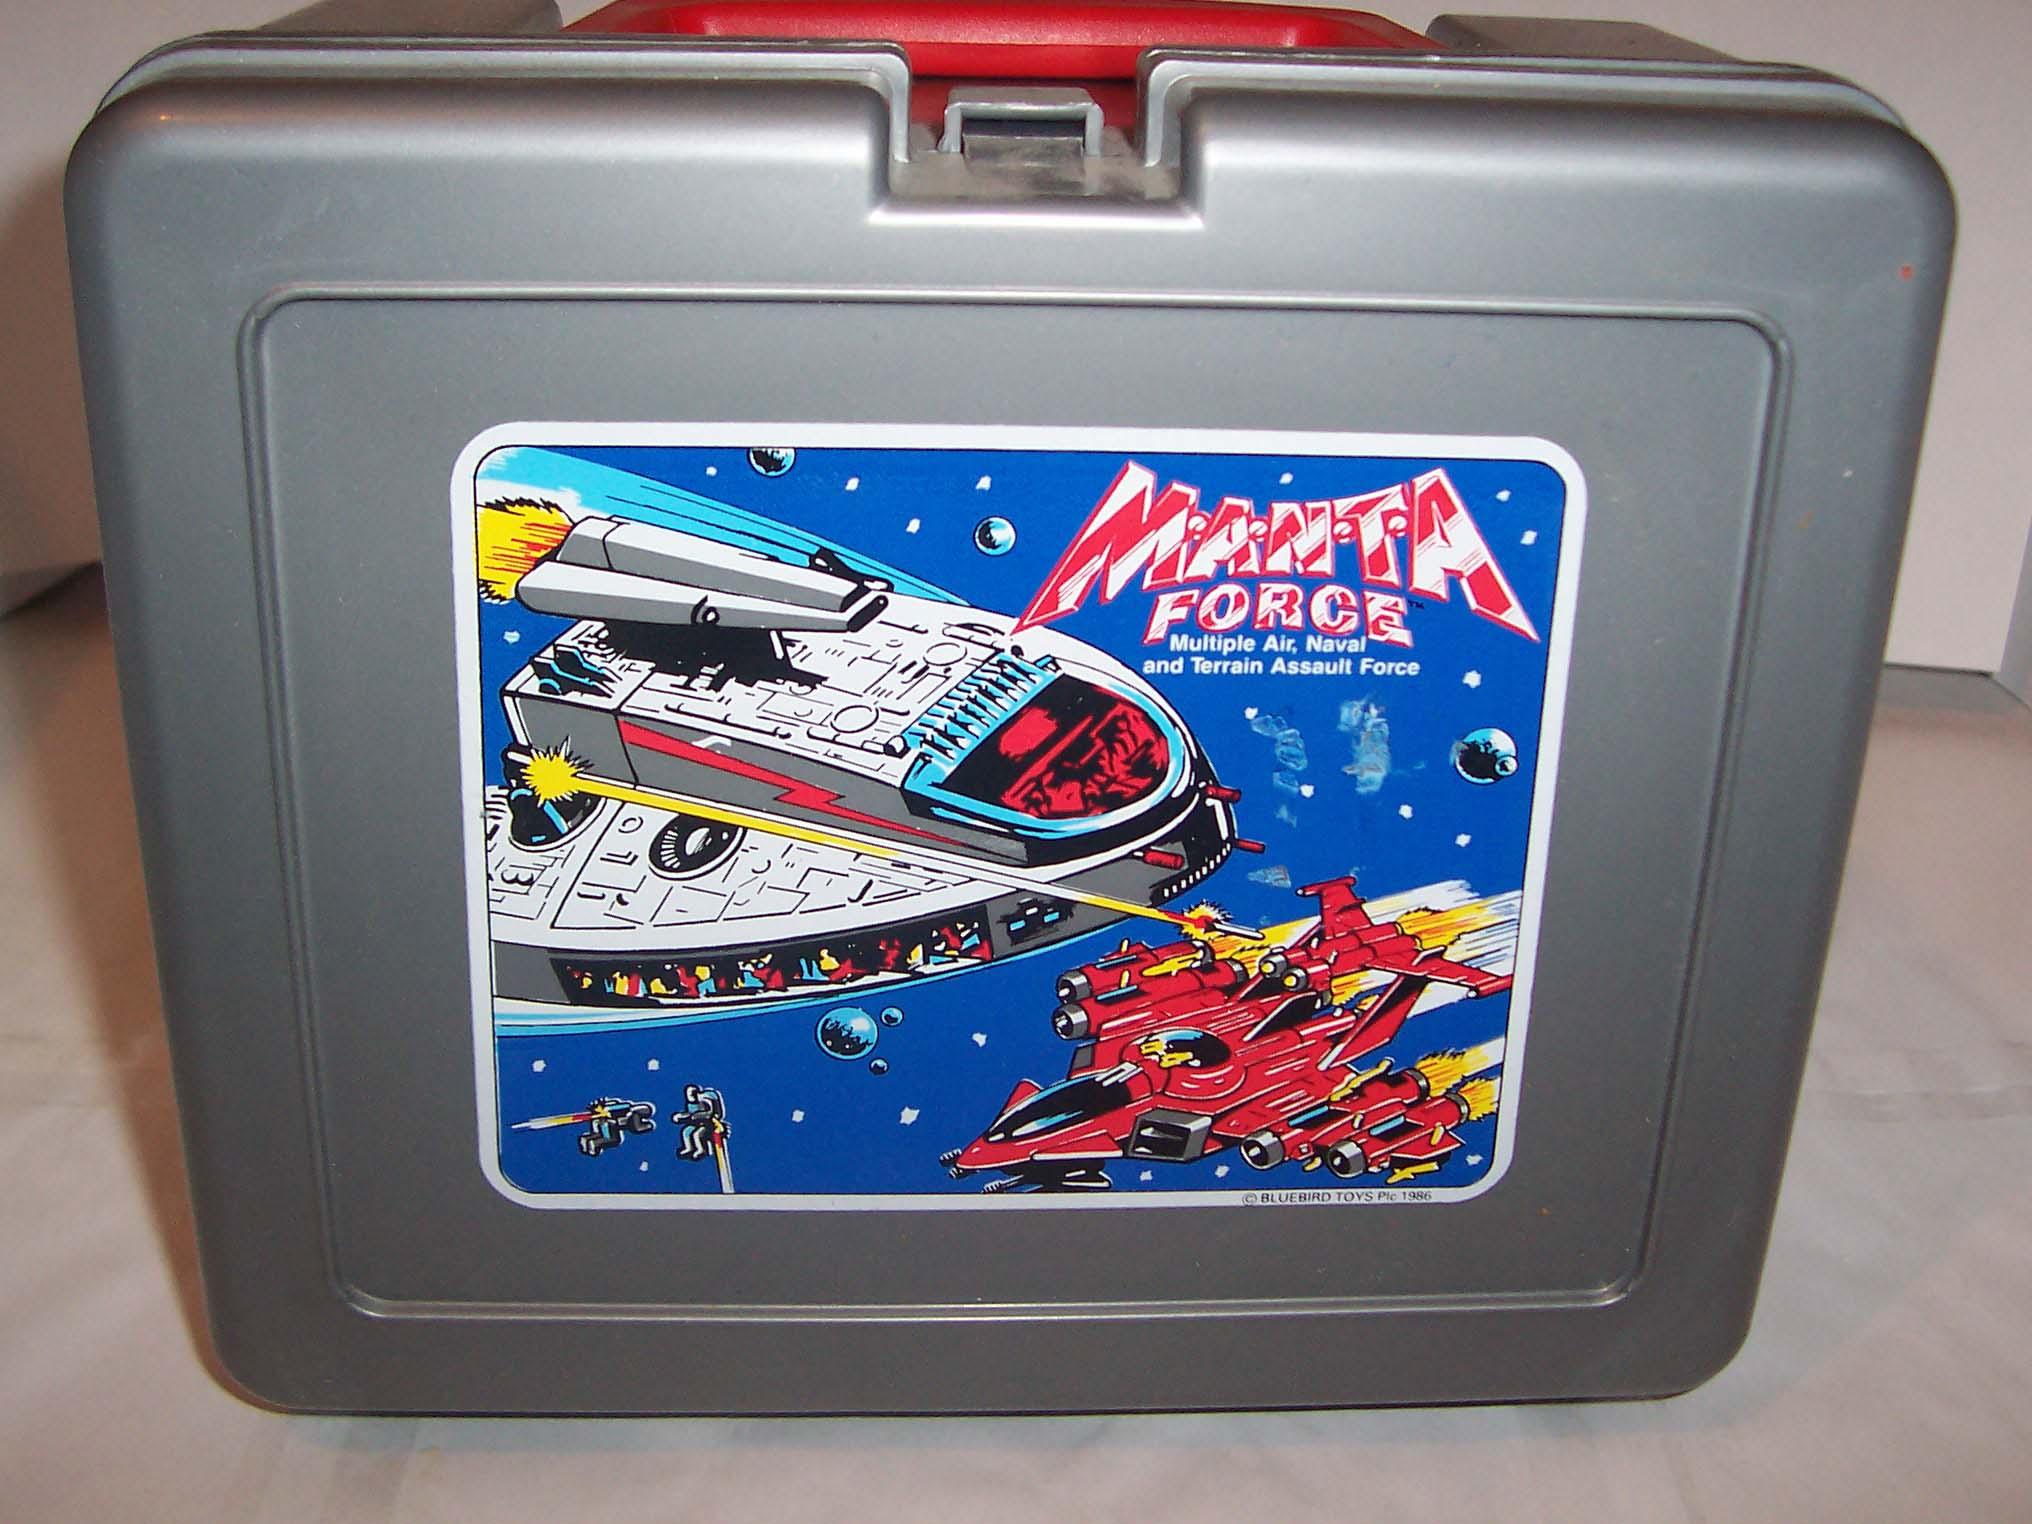 Manta Force - Lunch Box 001